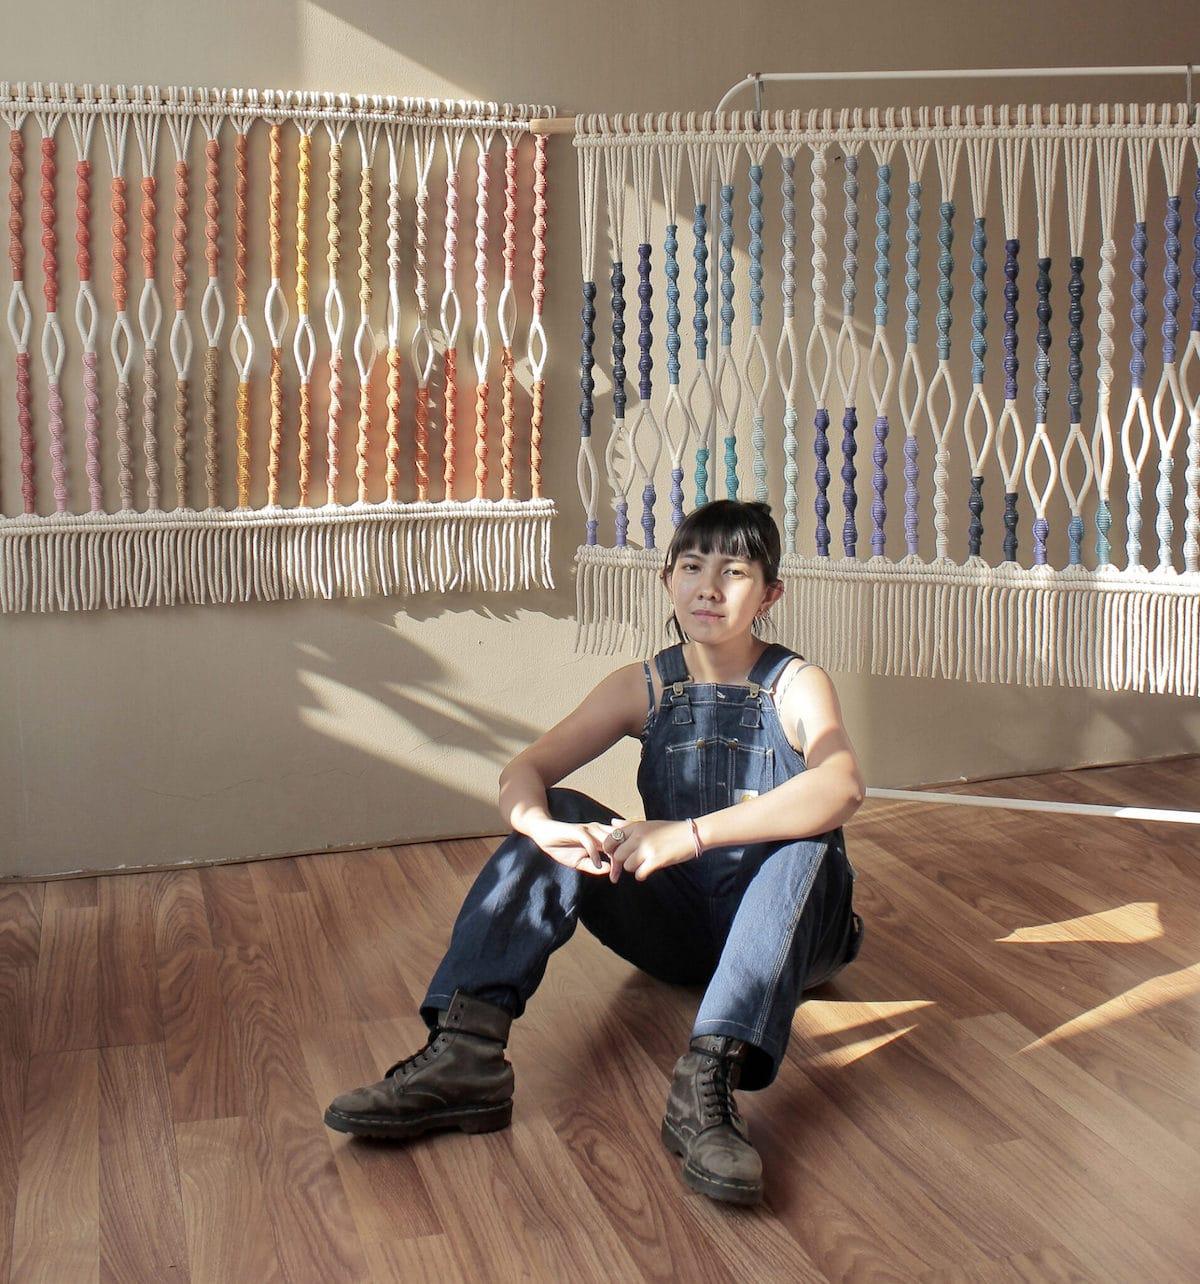 Artista Agnes Hansella con sus tapices de macrame